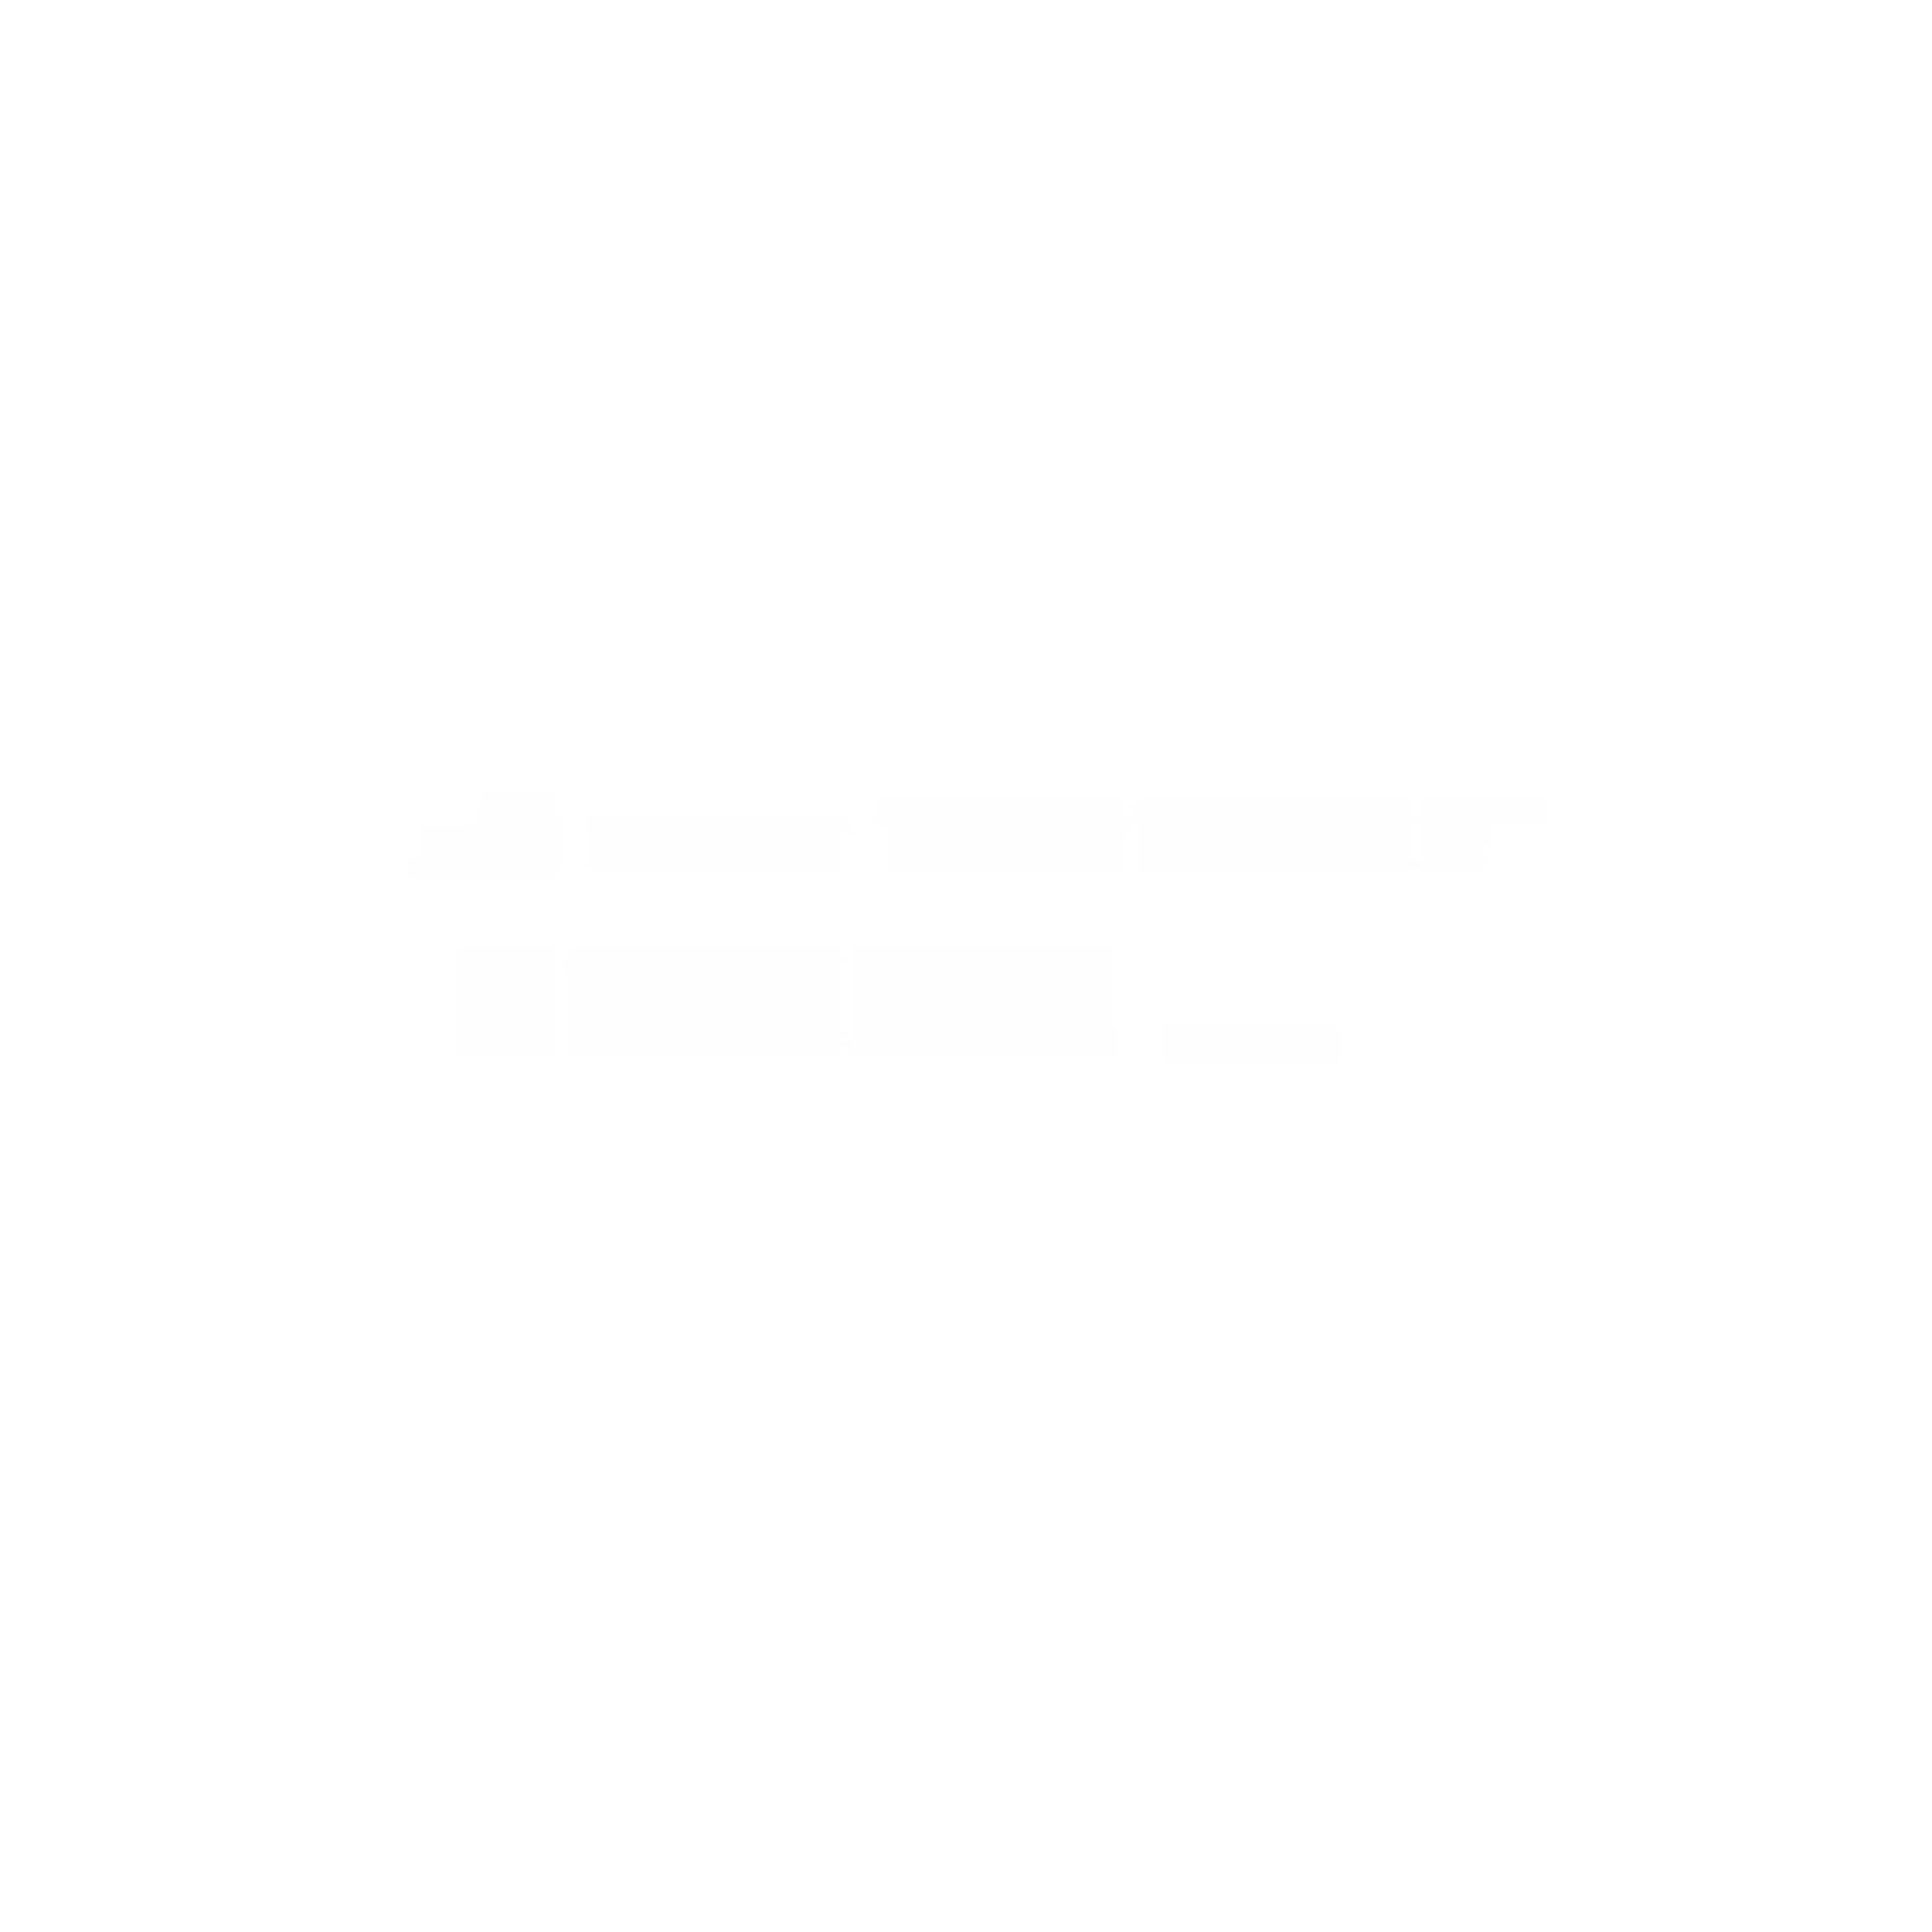 aureverie